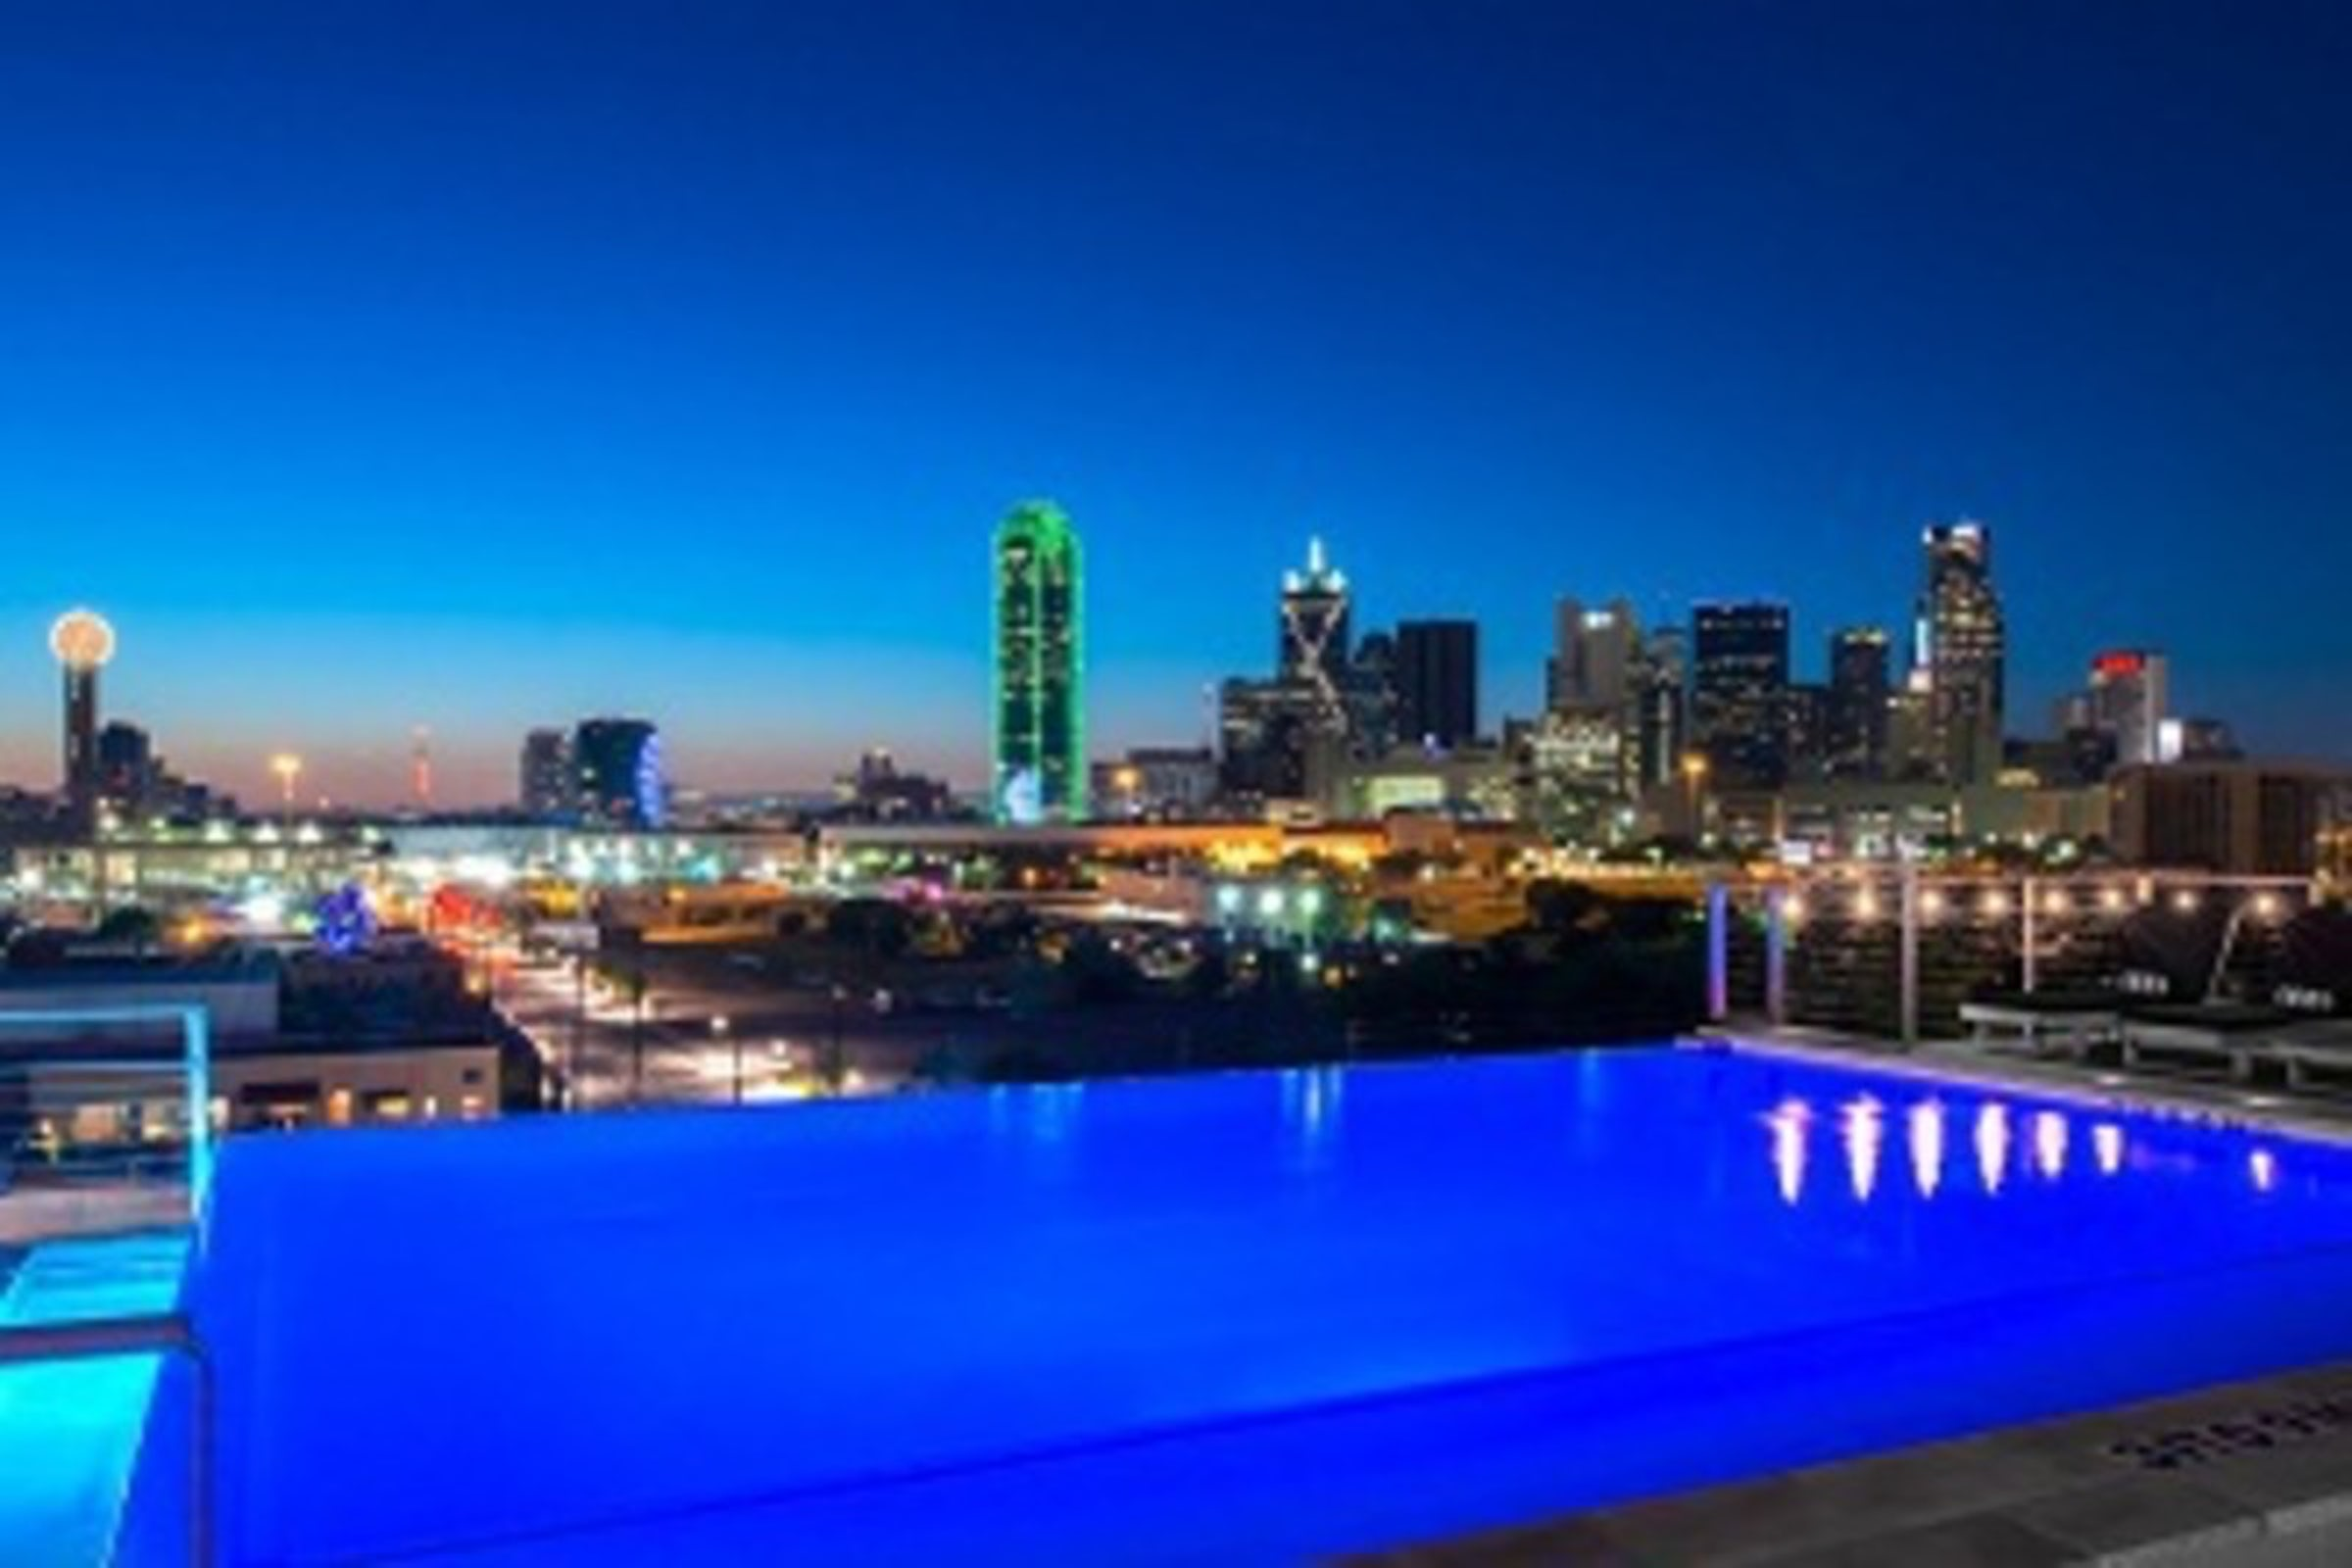 Chef's Palette in Beyond Dallas